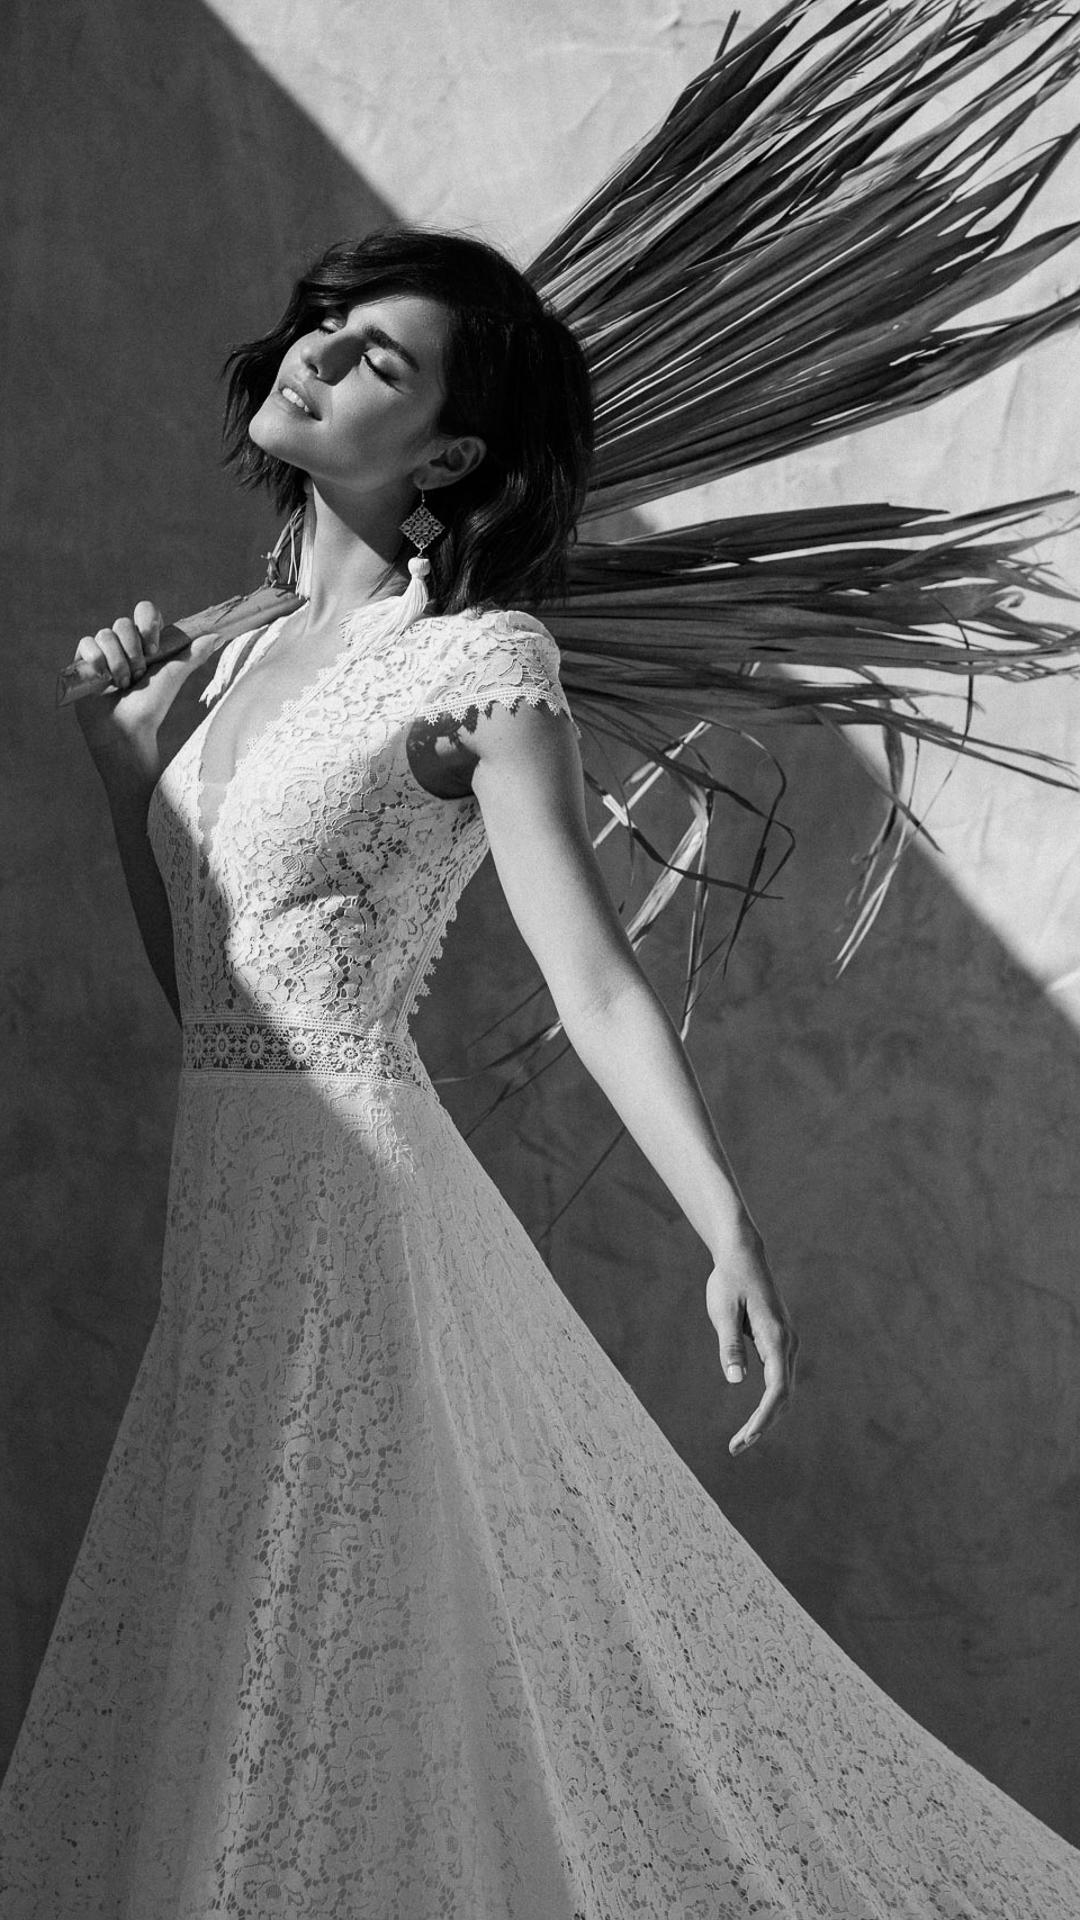 Loversland - Marylise Brautkleider 2020